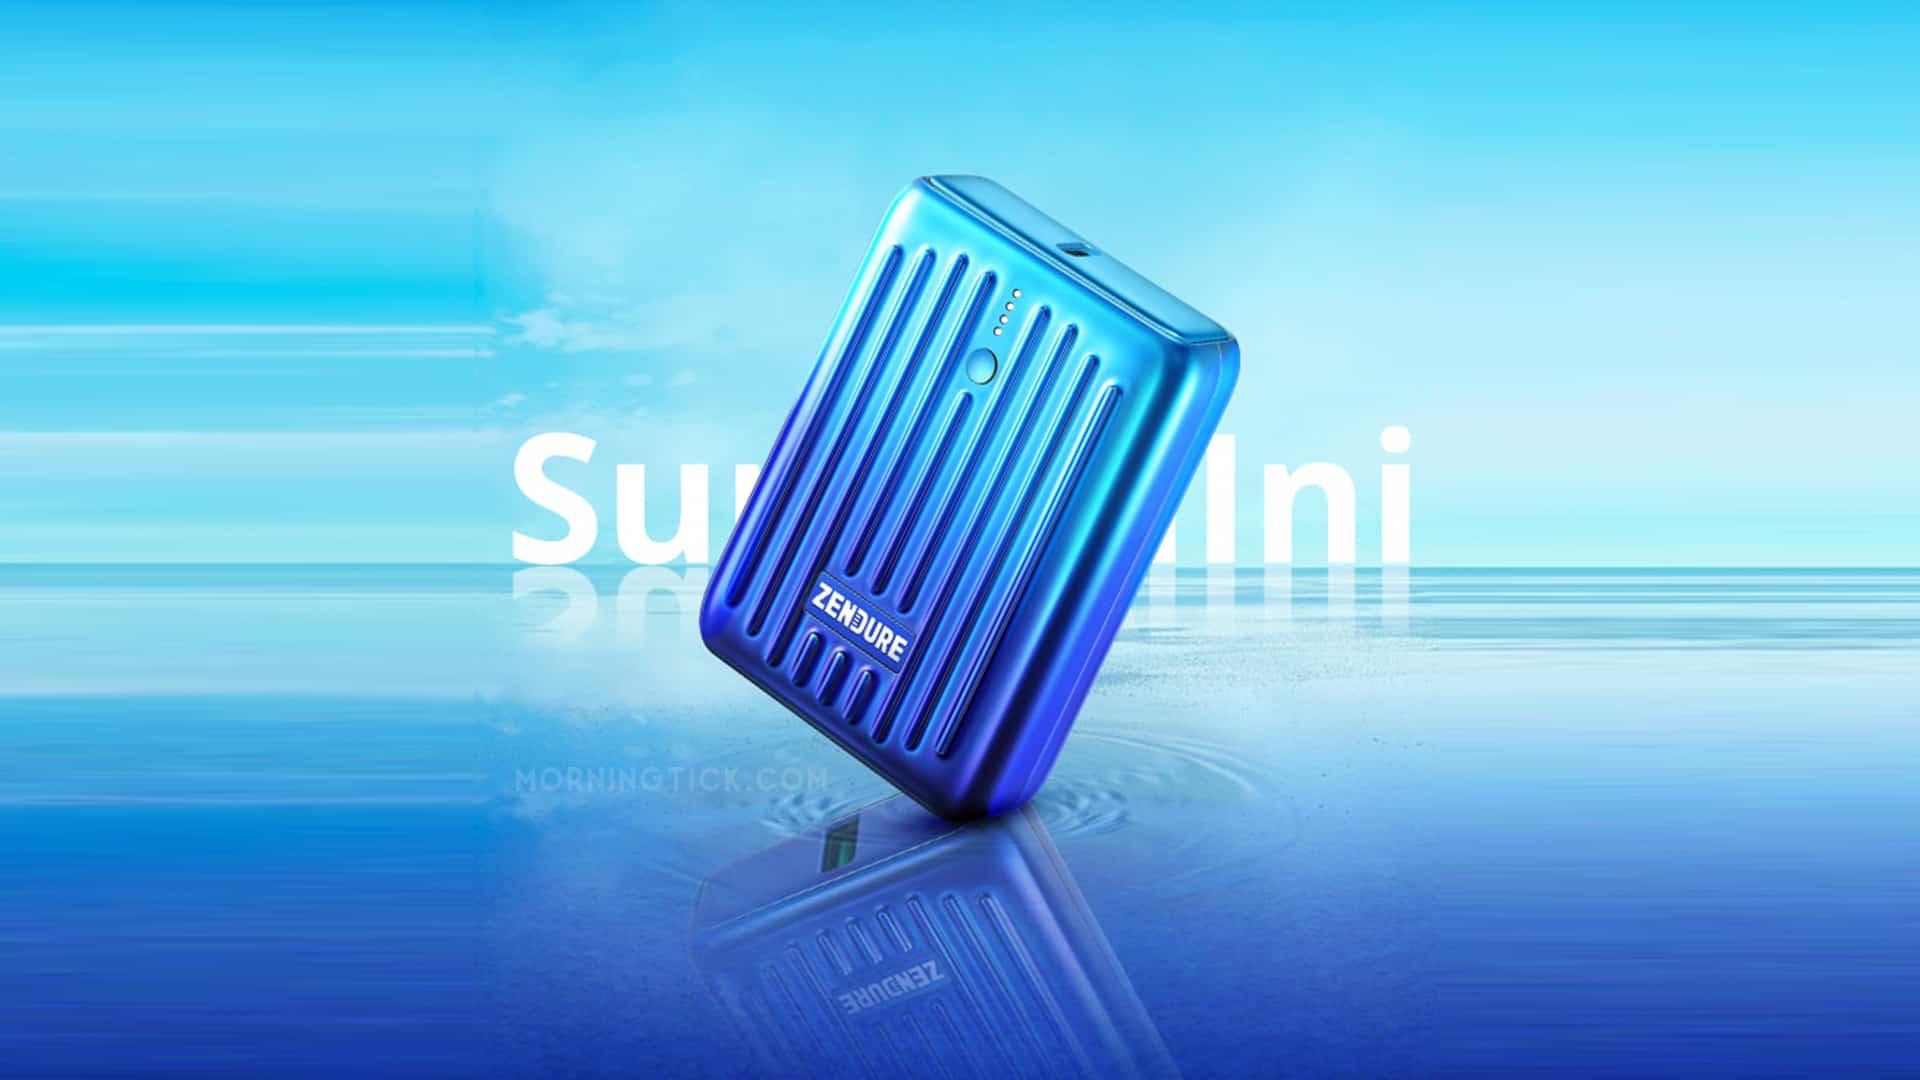 Zendure SuperMini: A Credit Card sized 10,000mAh Power Bank